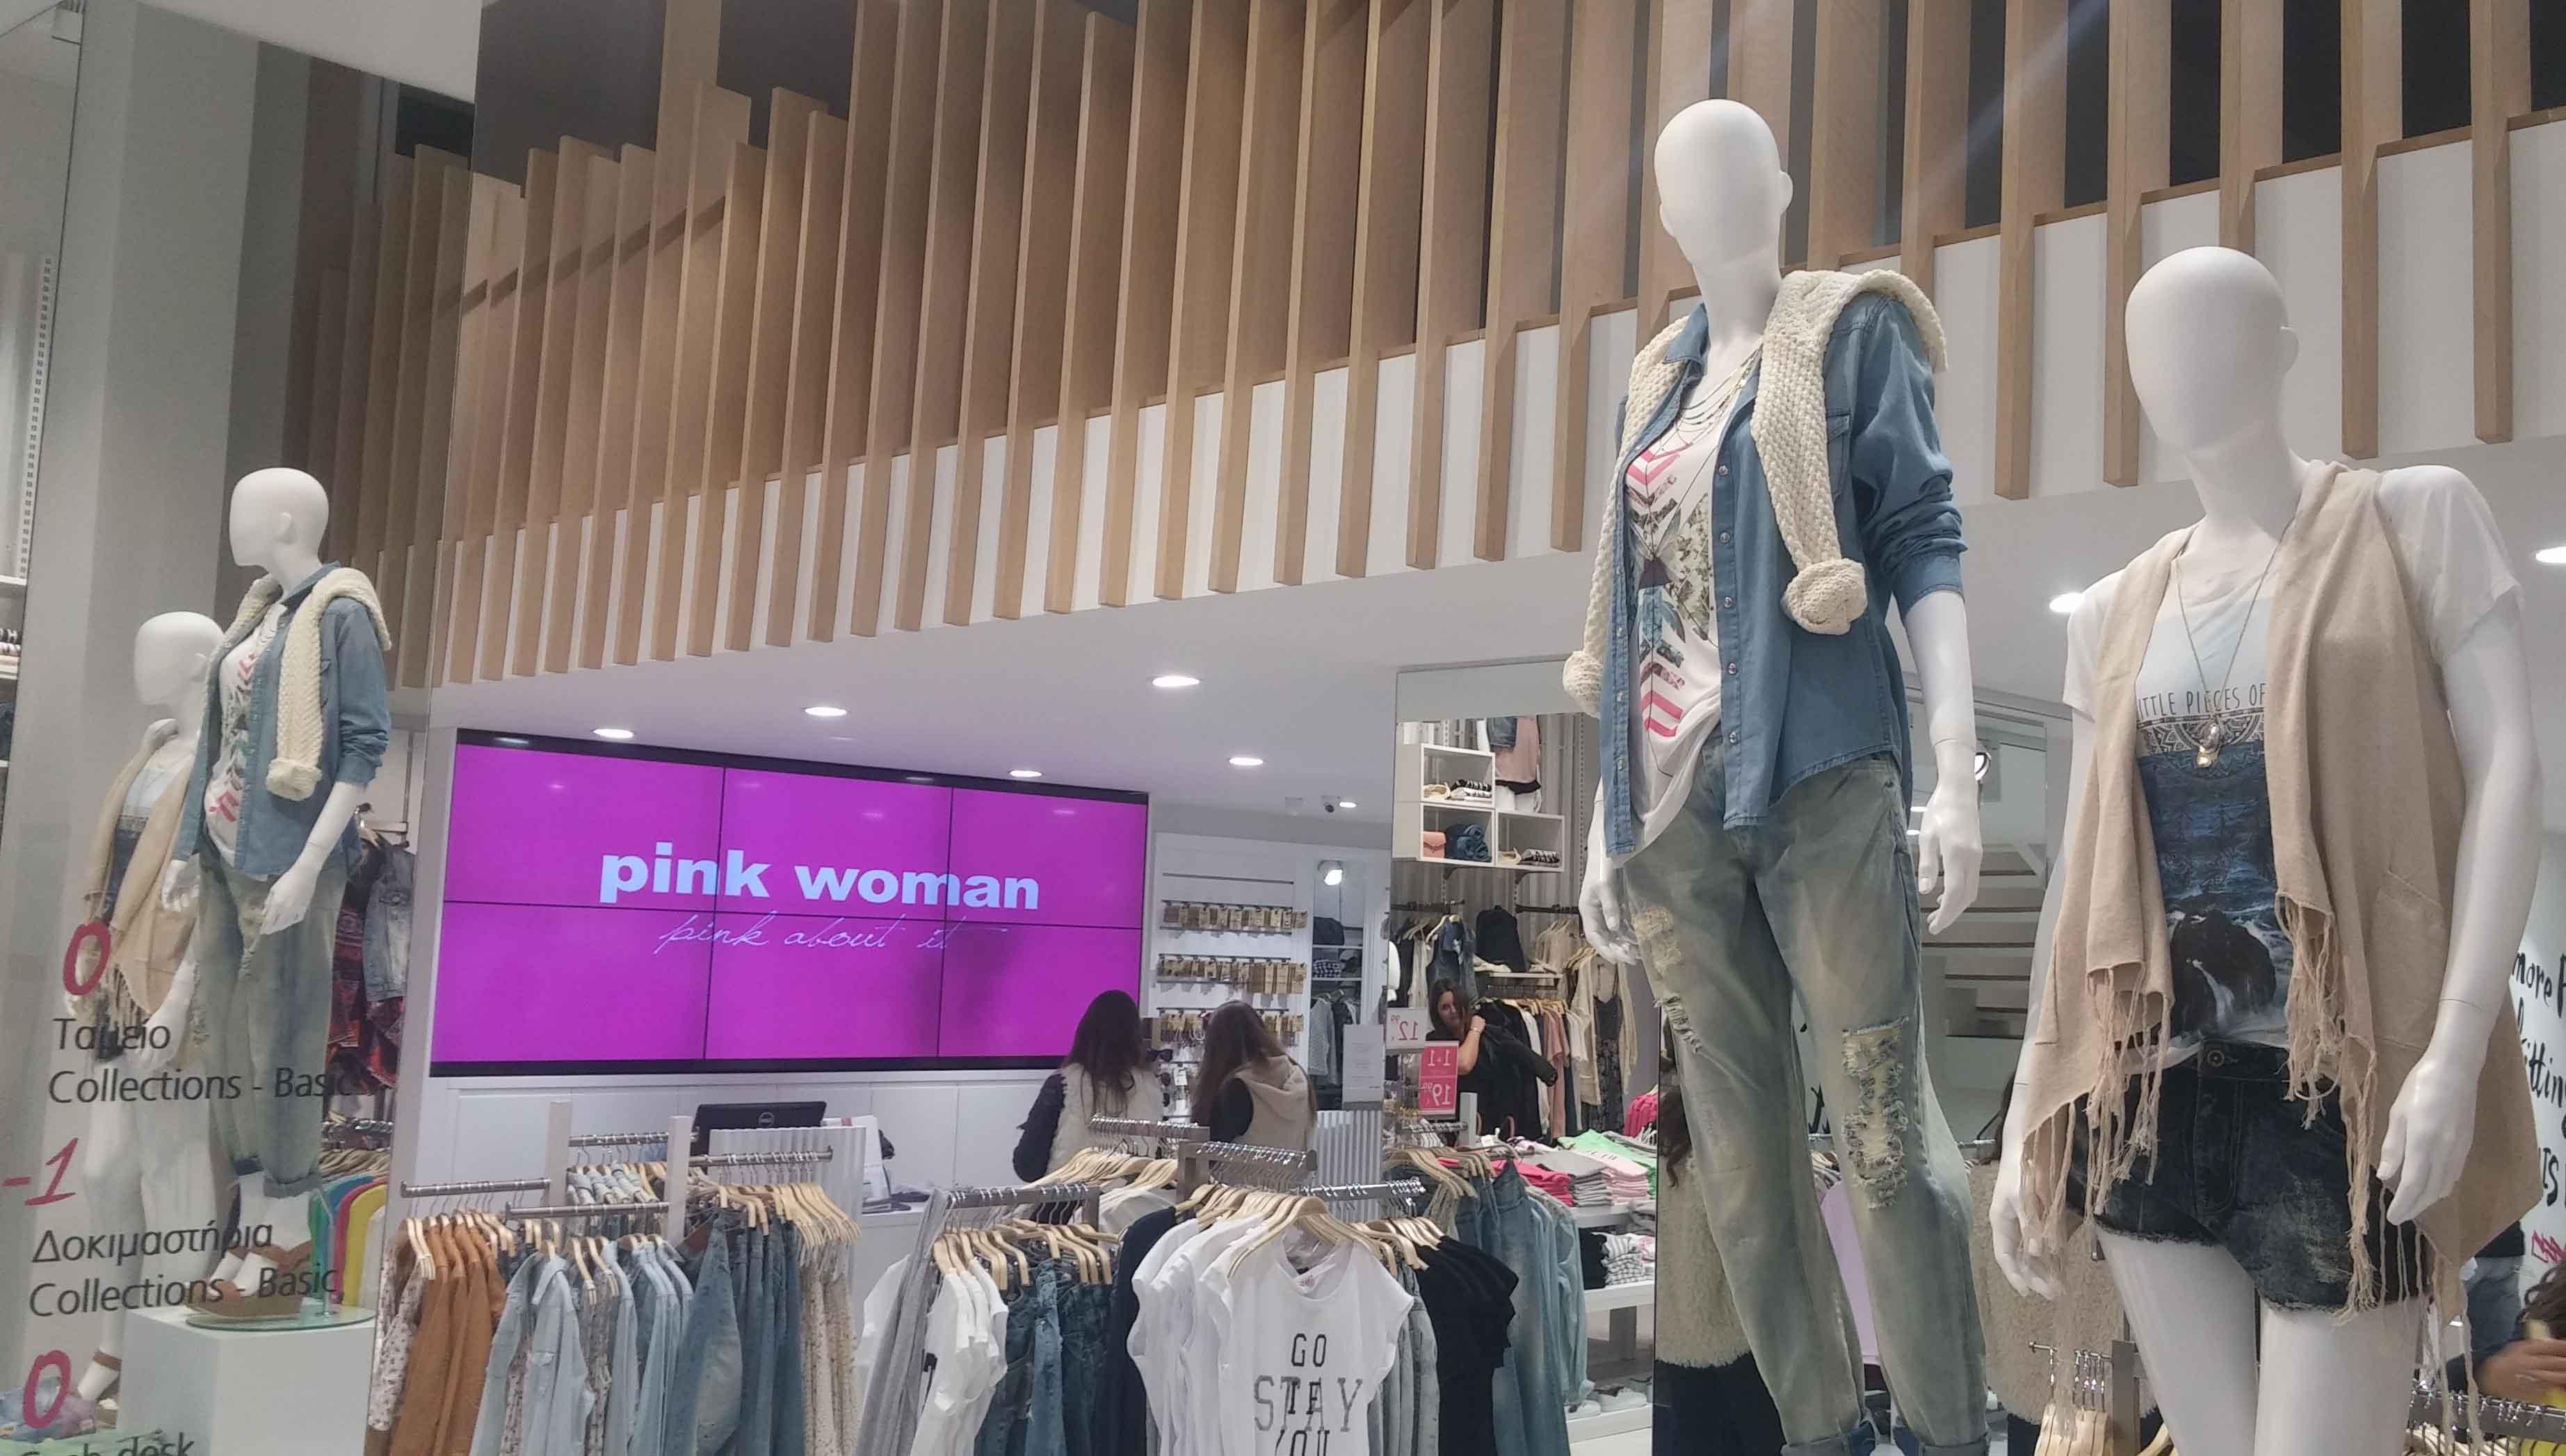 LG Signage case study_Pink woman 1